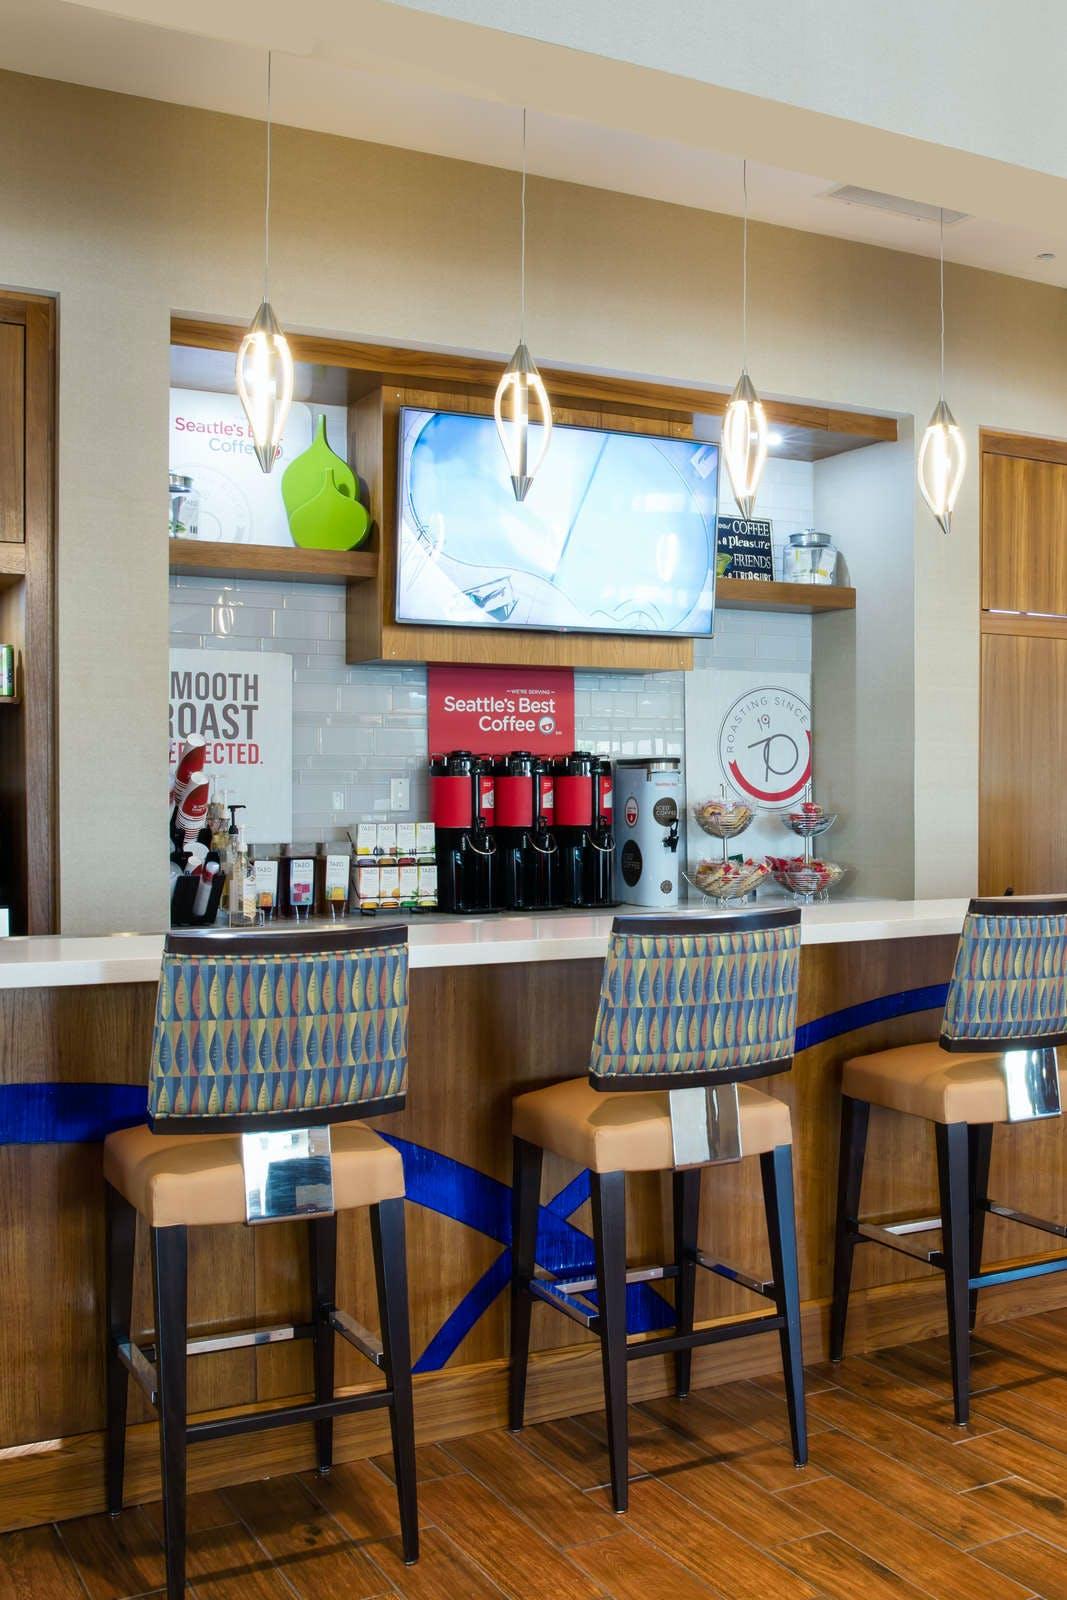 SpringHill Suites Orlando at Flamingo Crossing/West Entrance